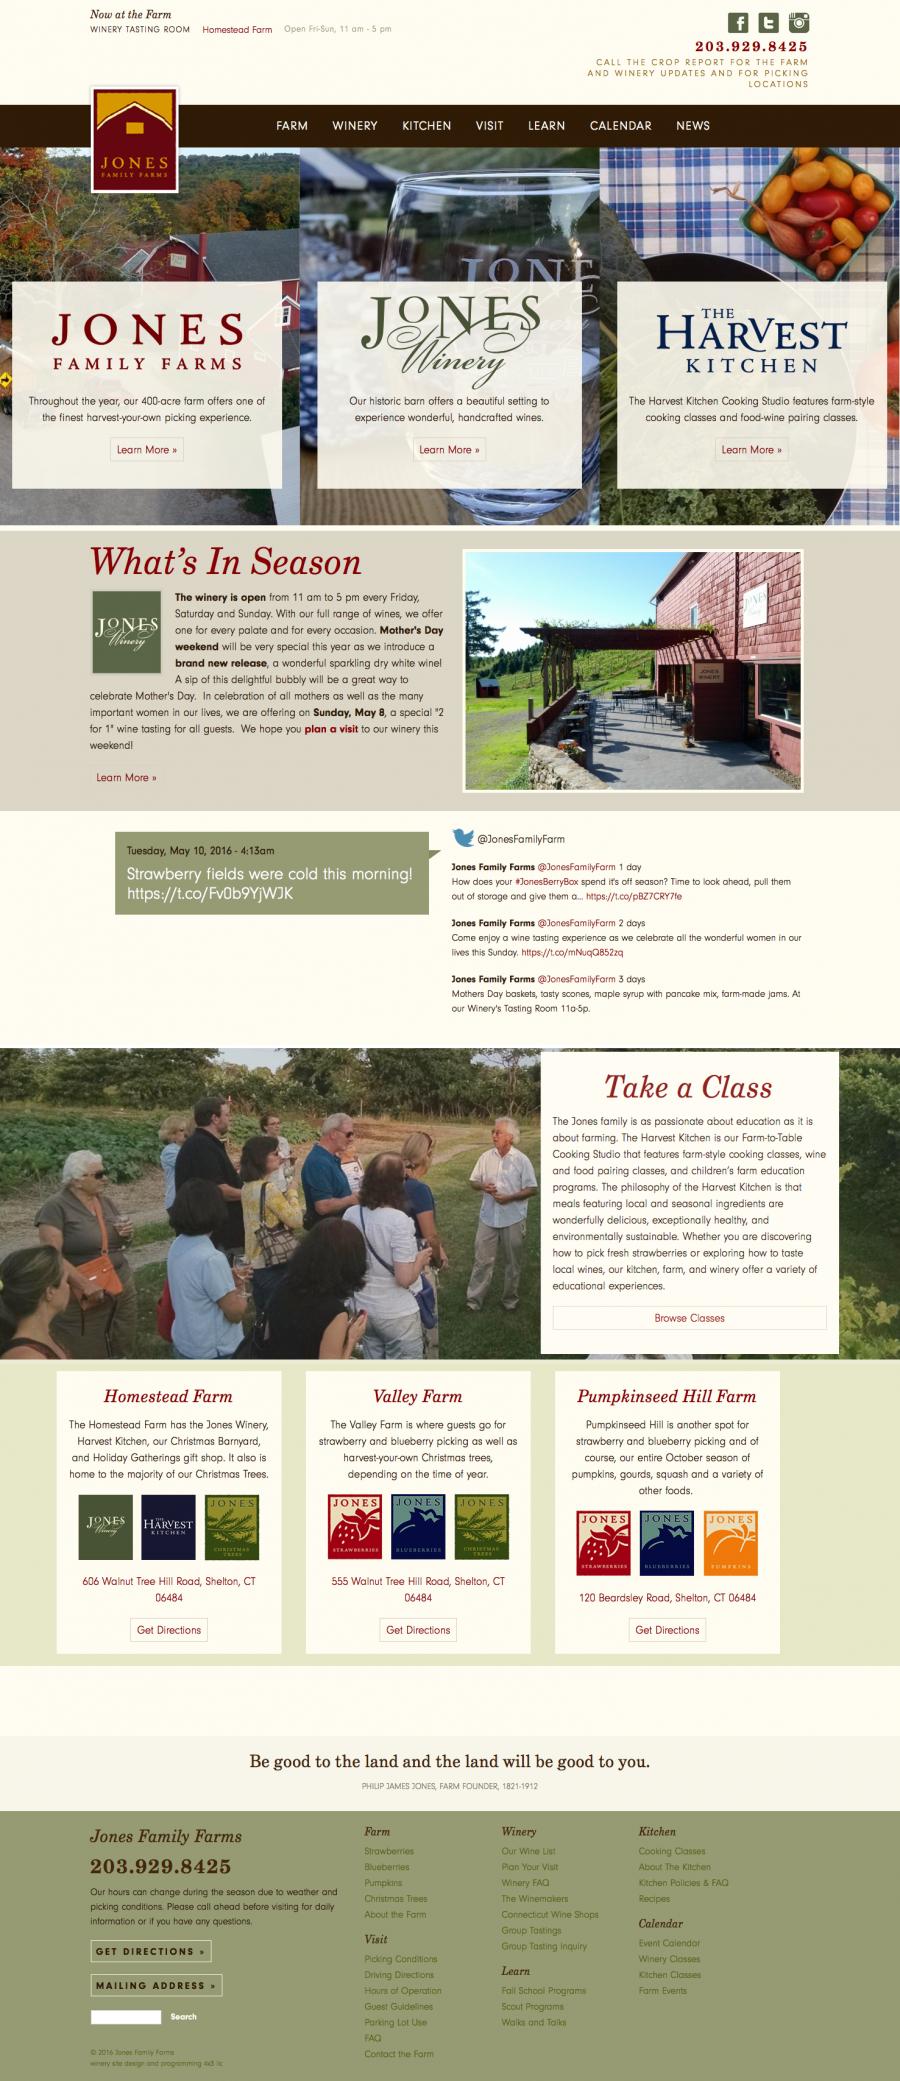 Jones Home Page